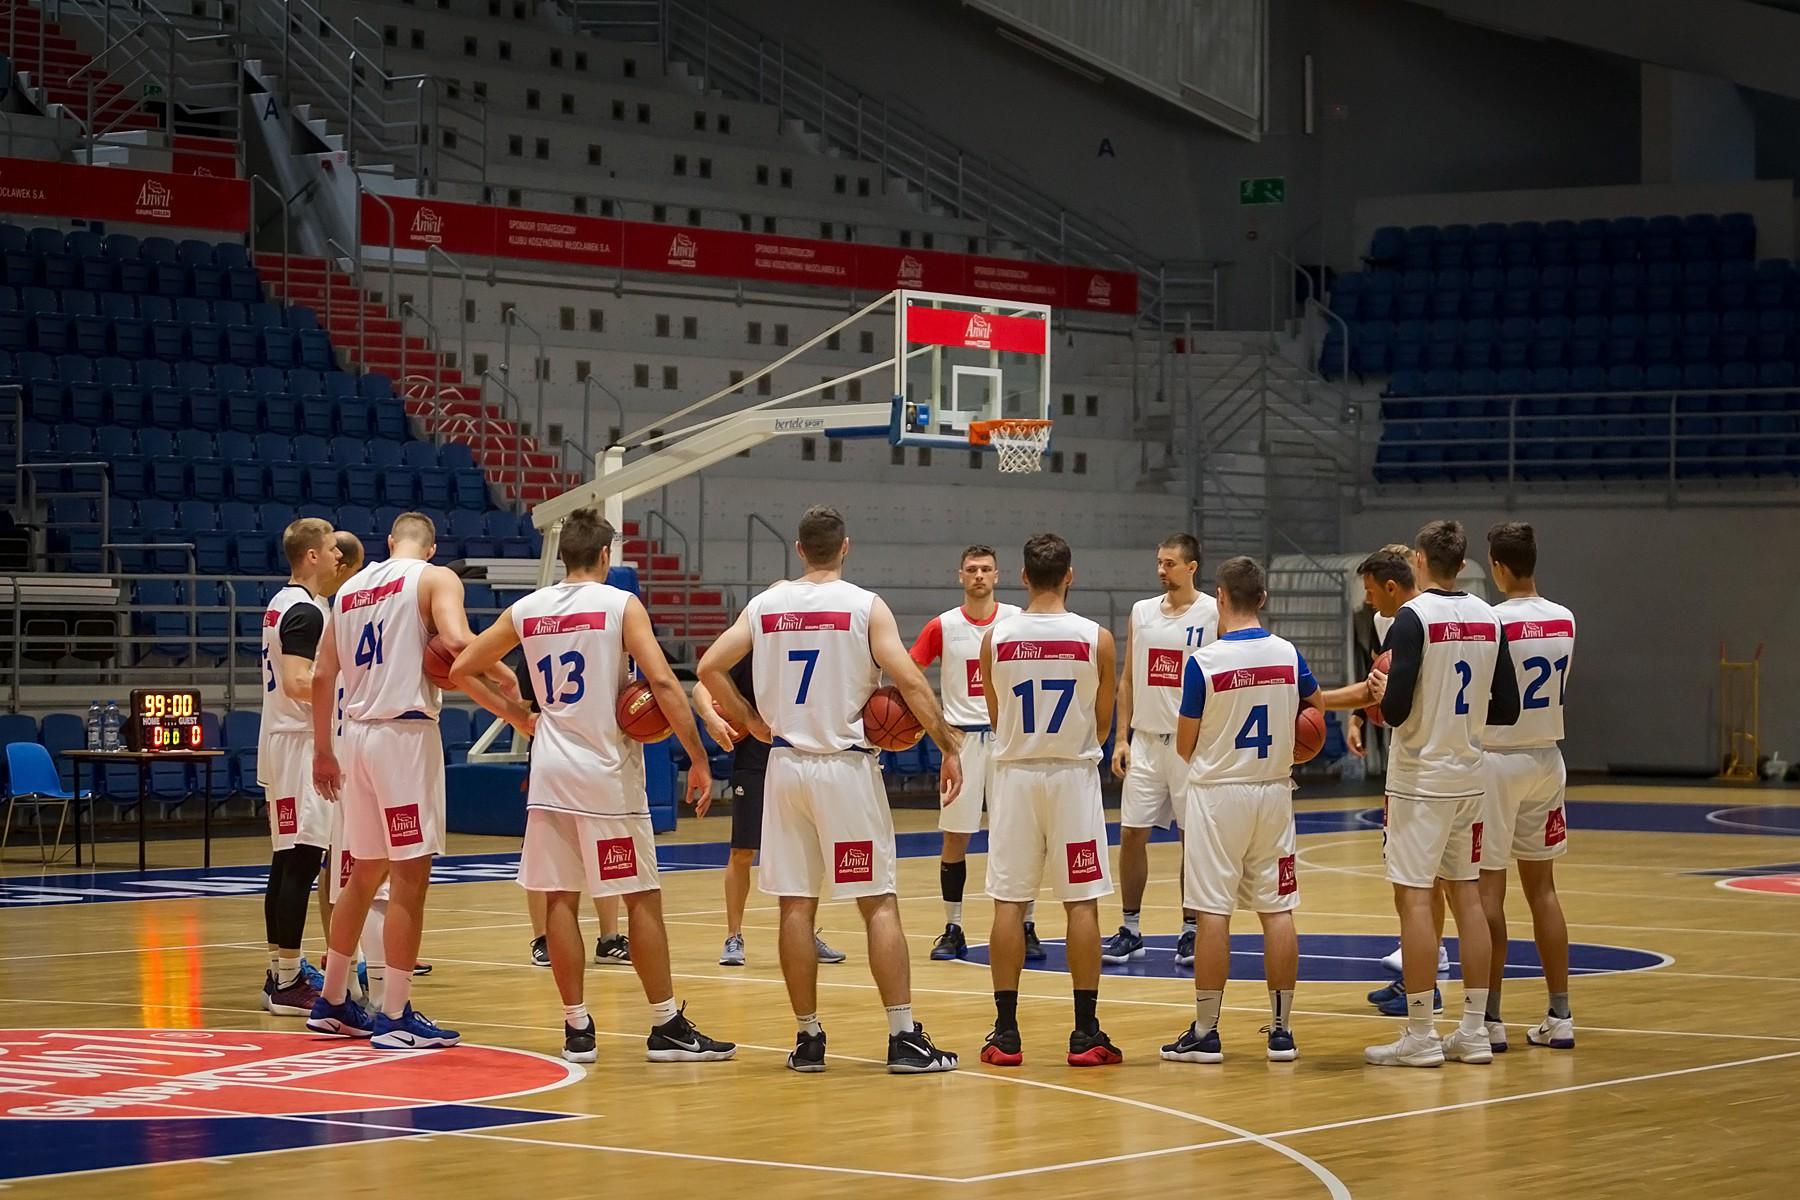 Terminarz Energa Basket Ligi sezonu 2018/2019